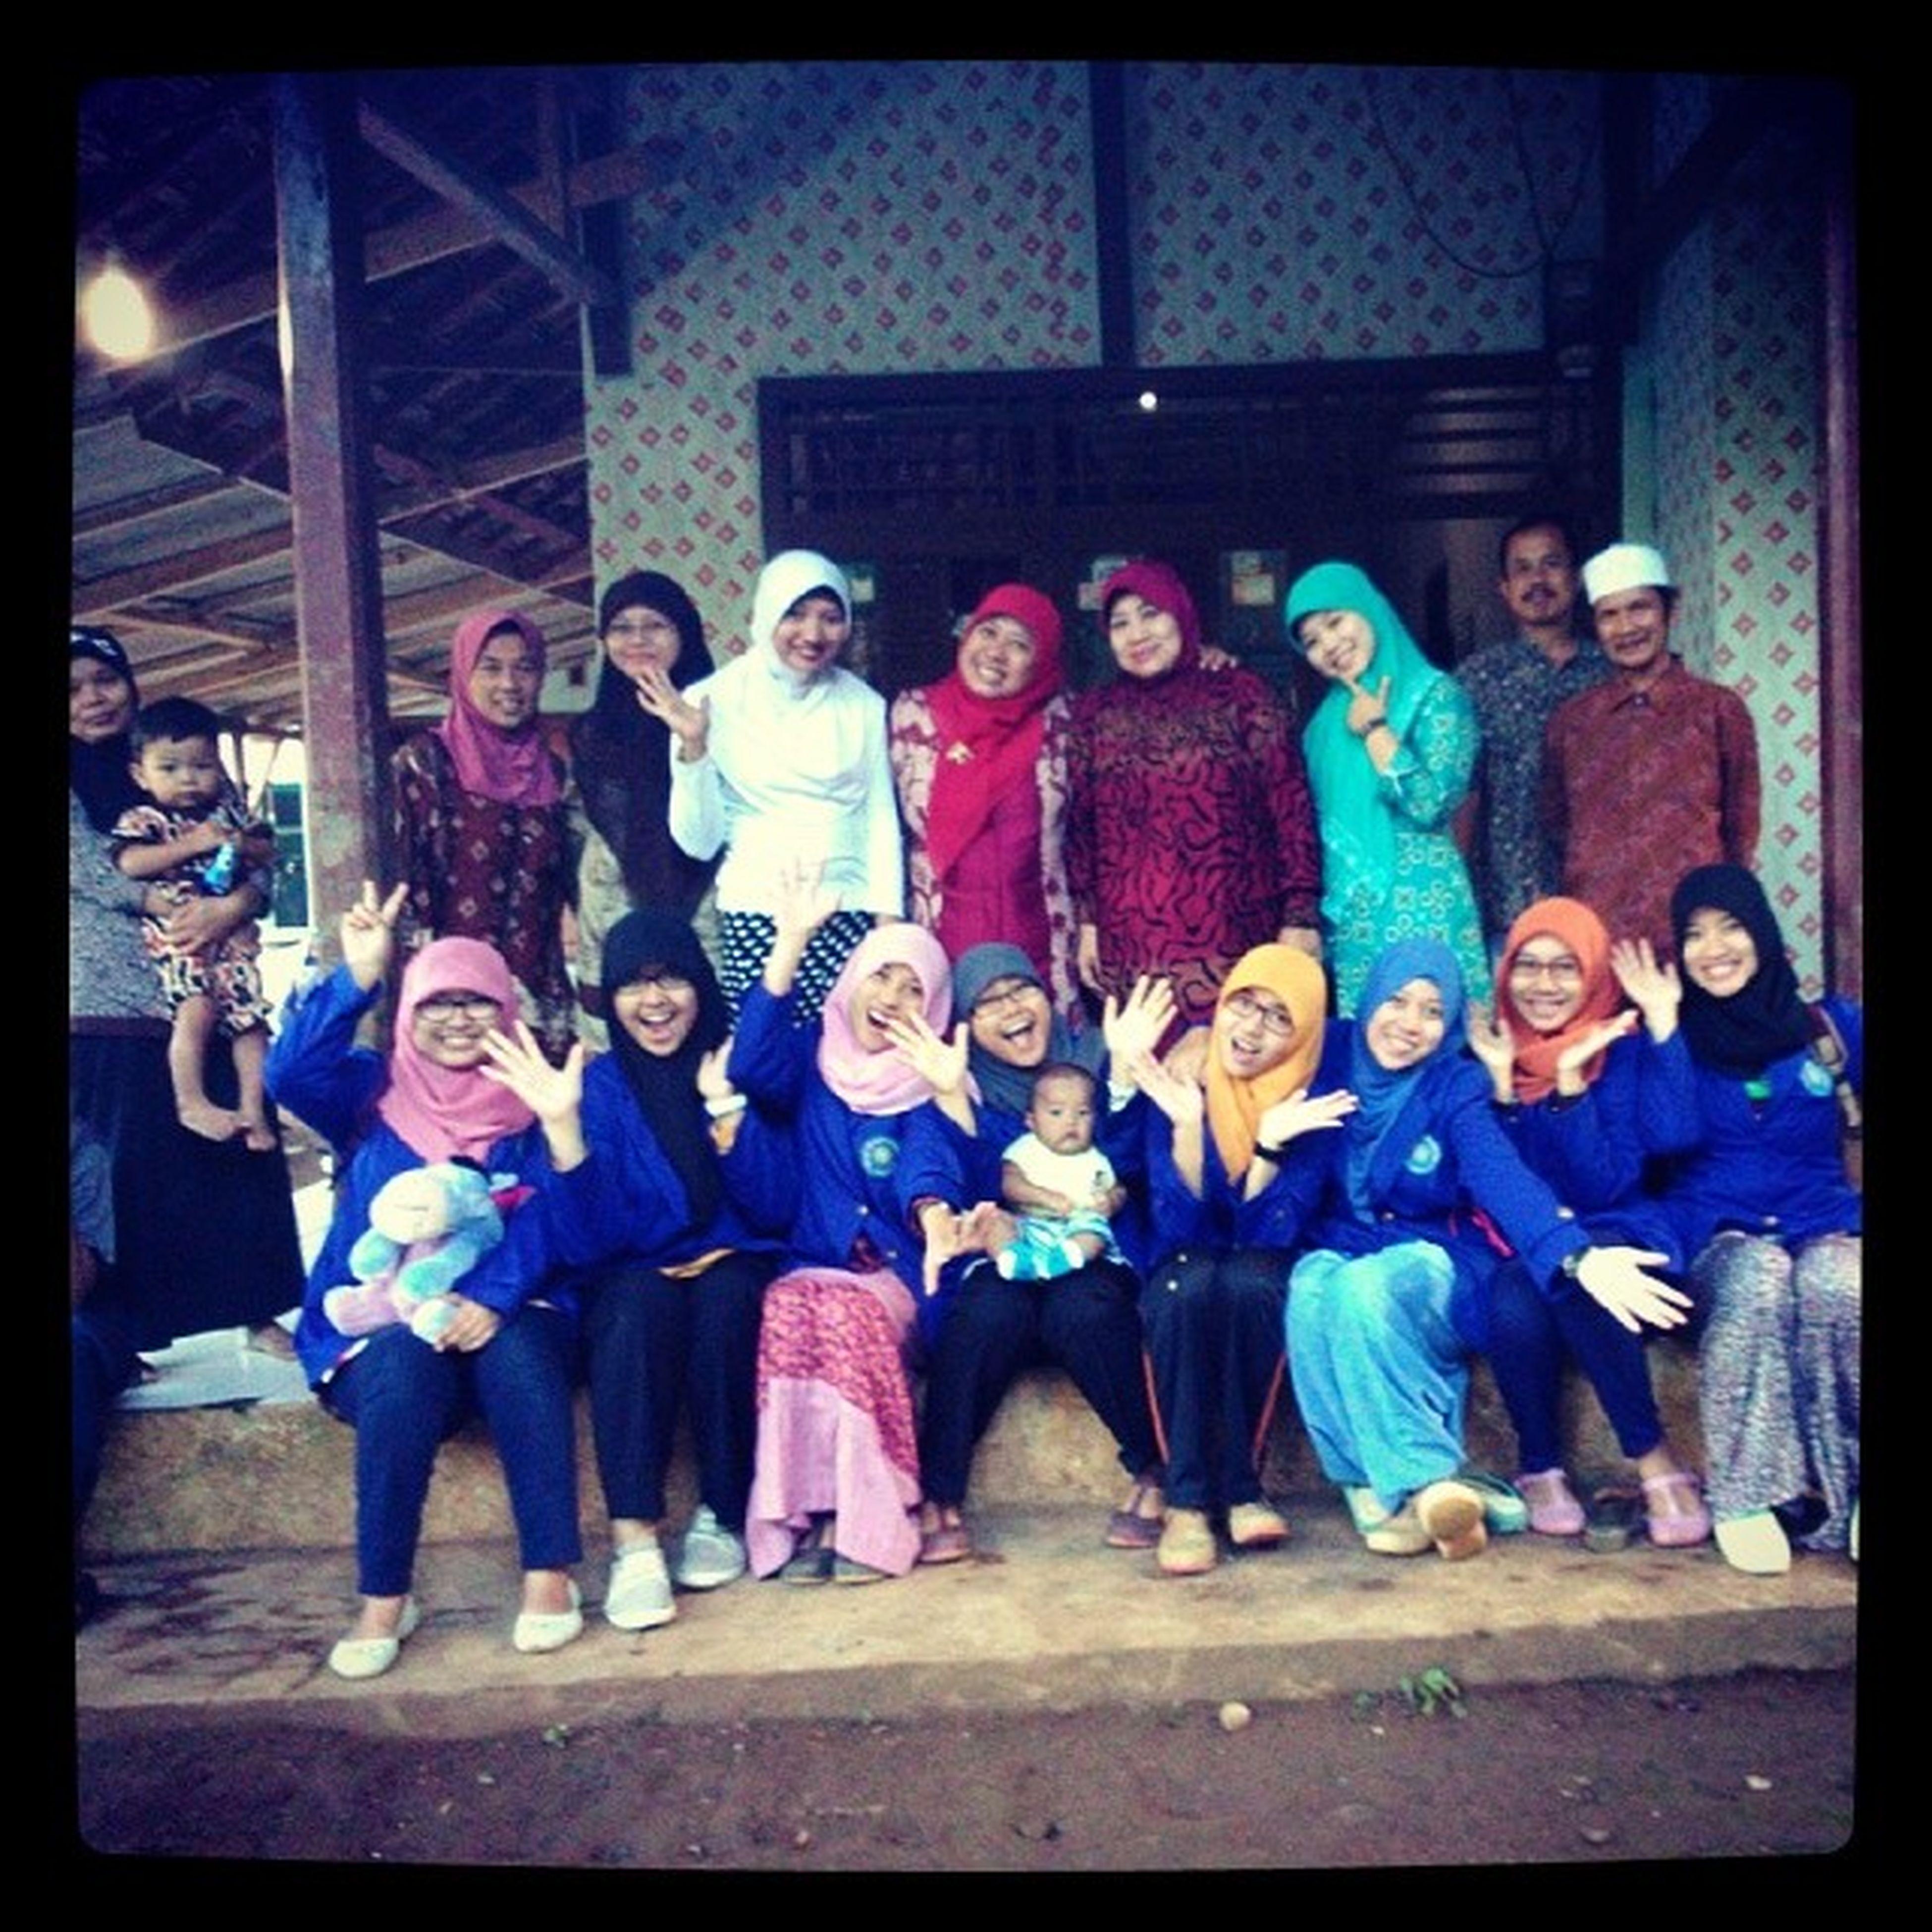 We are the team \m/ Pkk Cikumbueun Bapakzuhdi Loveable